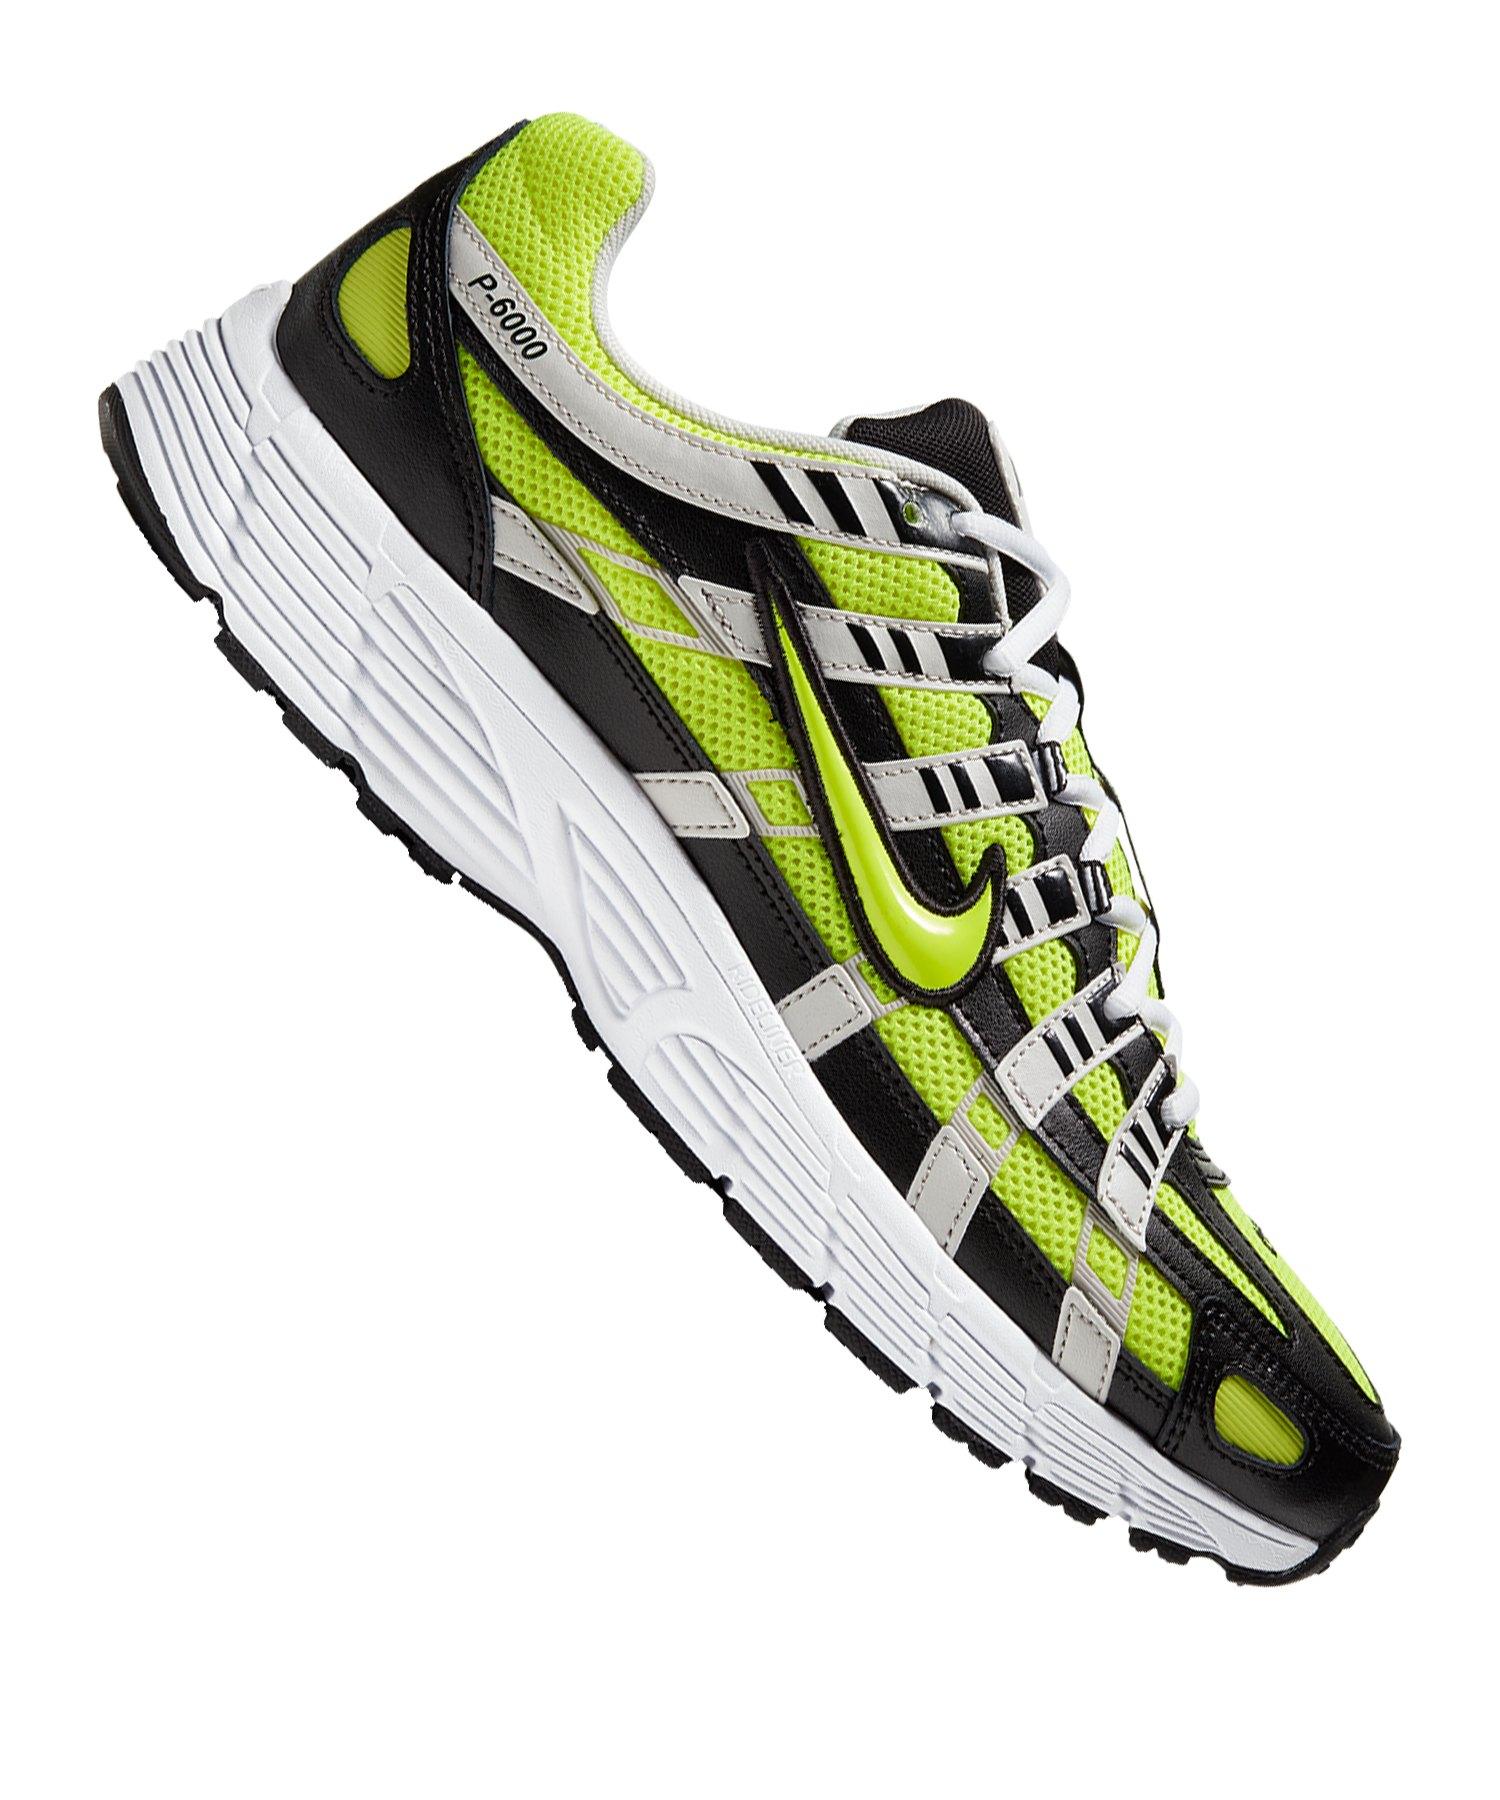 Advanced Design Nike Air Max 95 Beige Green White Gum Women's Ladie's Running Training Shoes DC008937